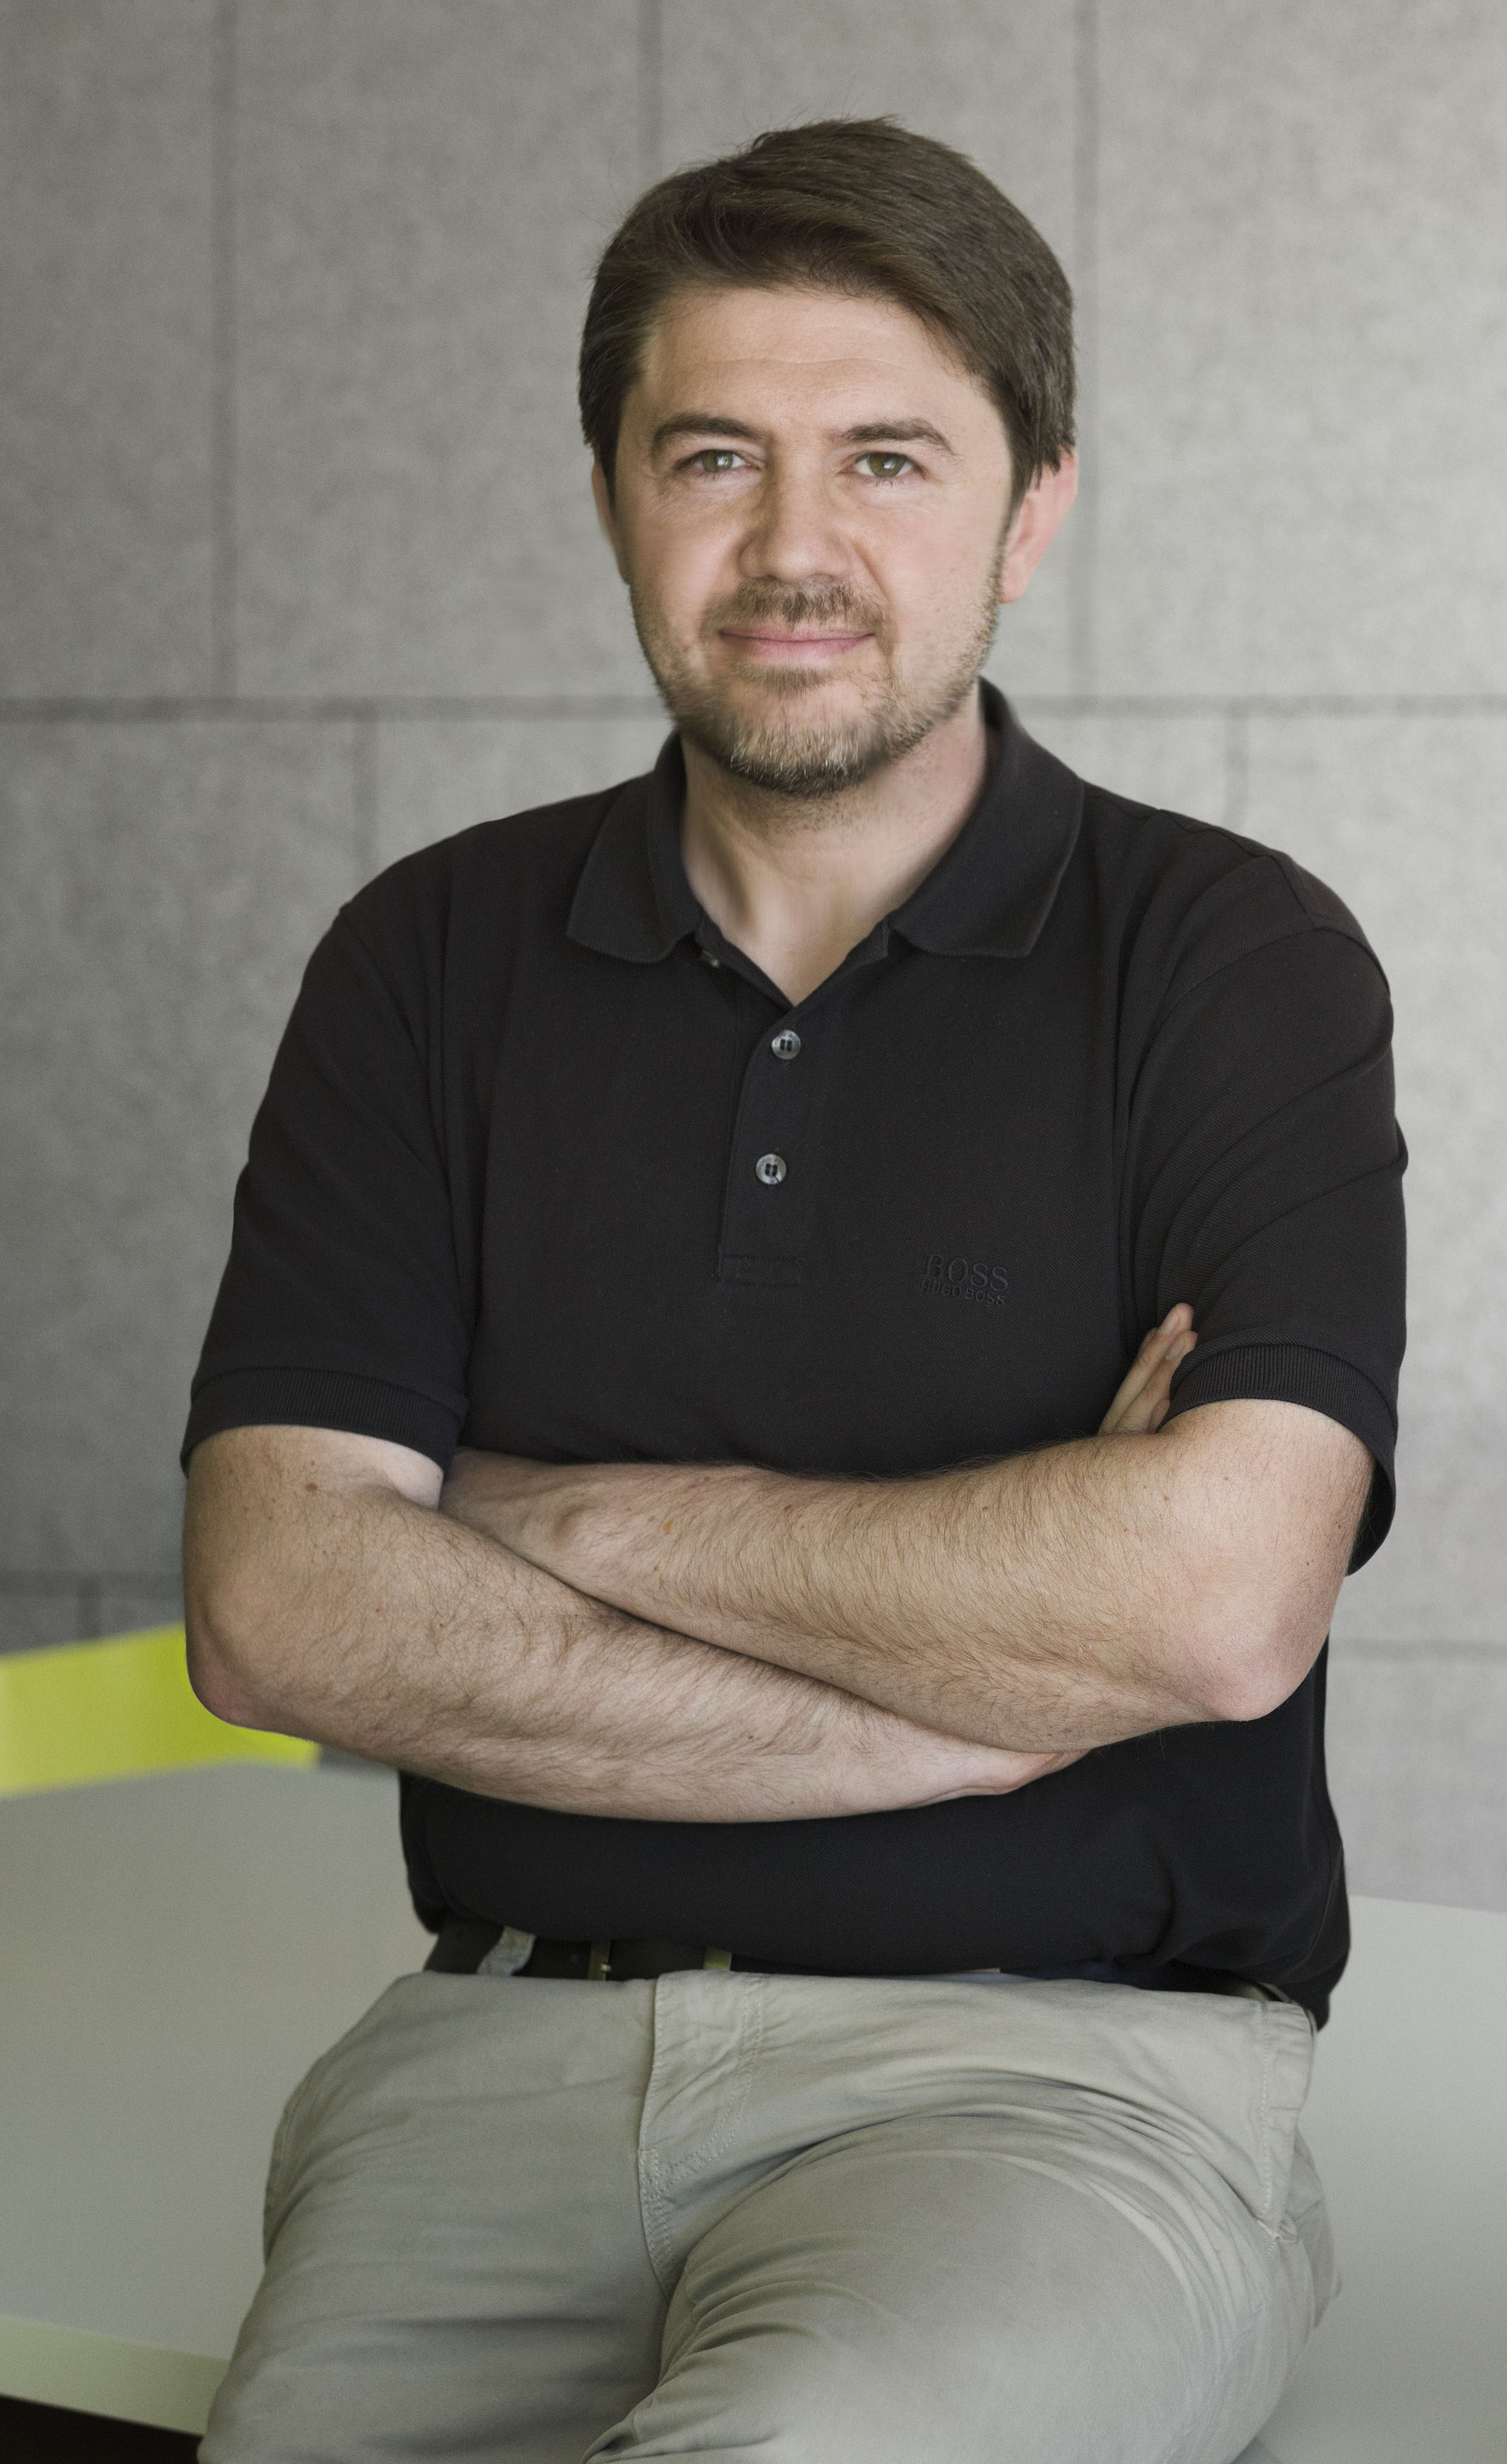 Jorge Javier Camacho Diez